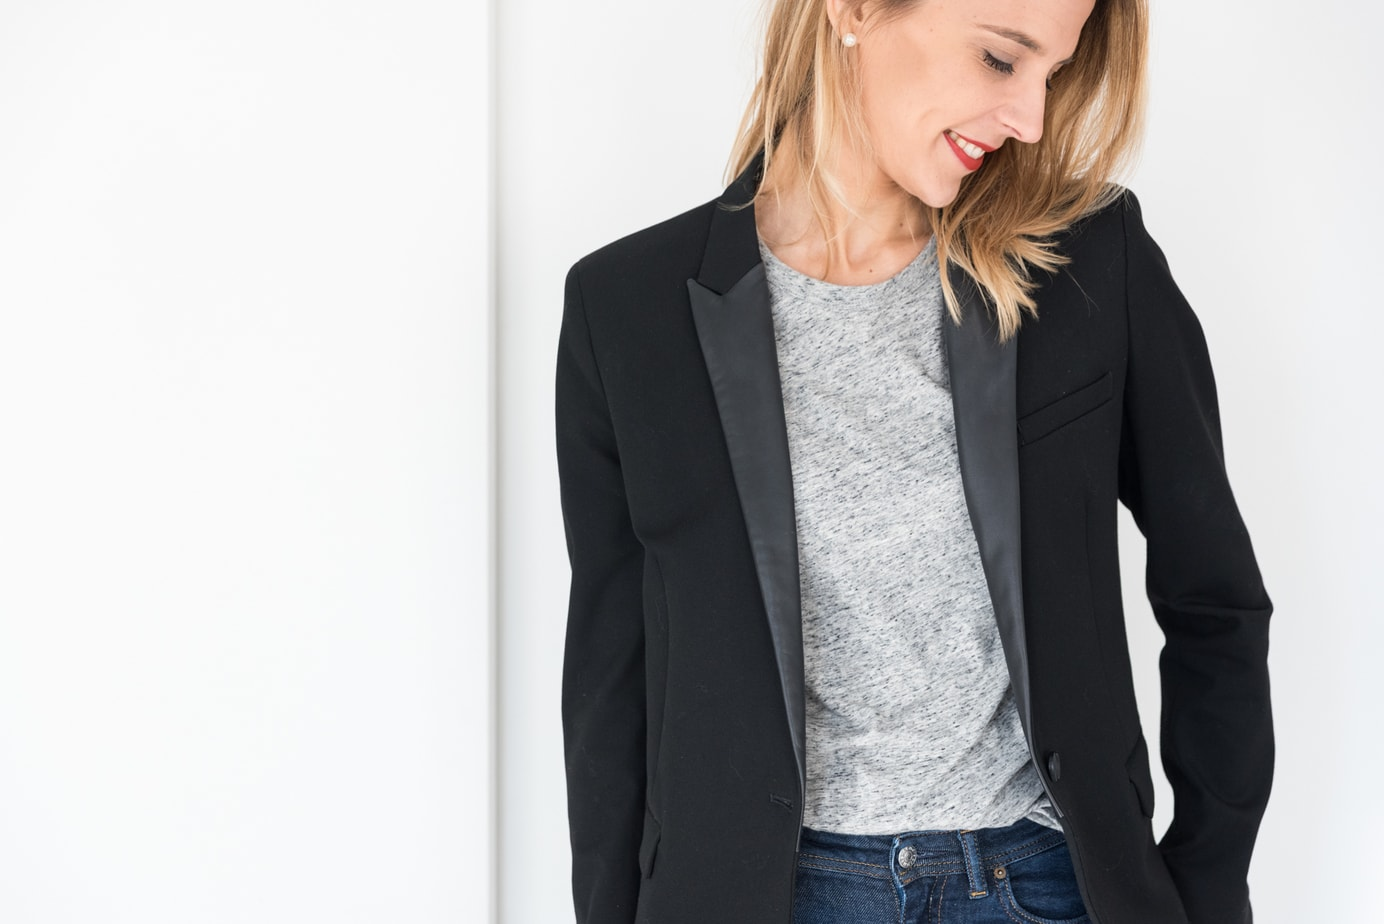 le blazer noir le dressing id al. Black Bedroom Furniture Sets. Home Design Ideas